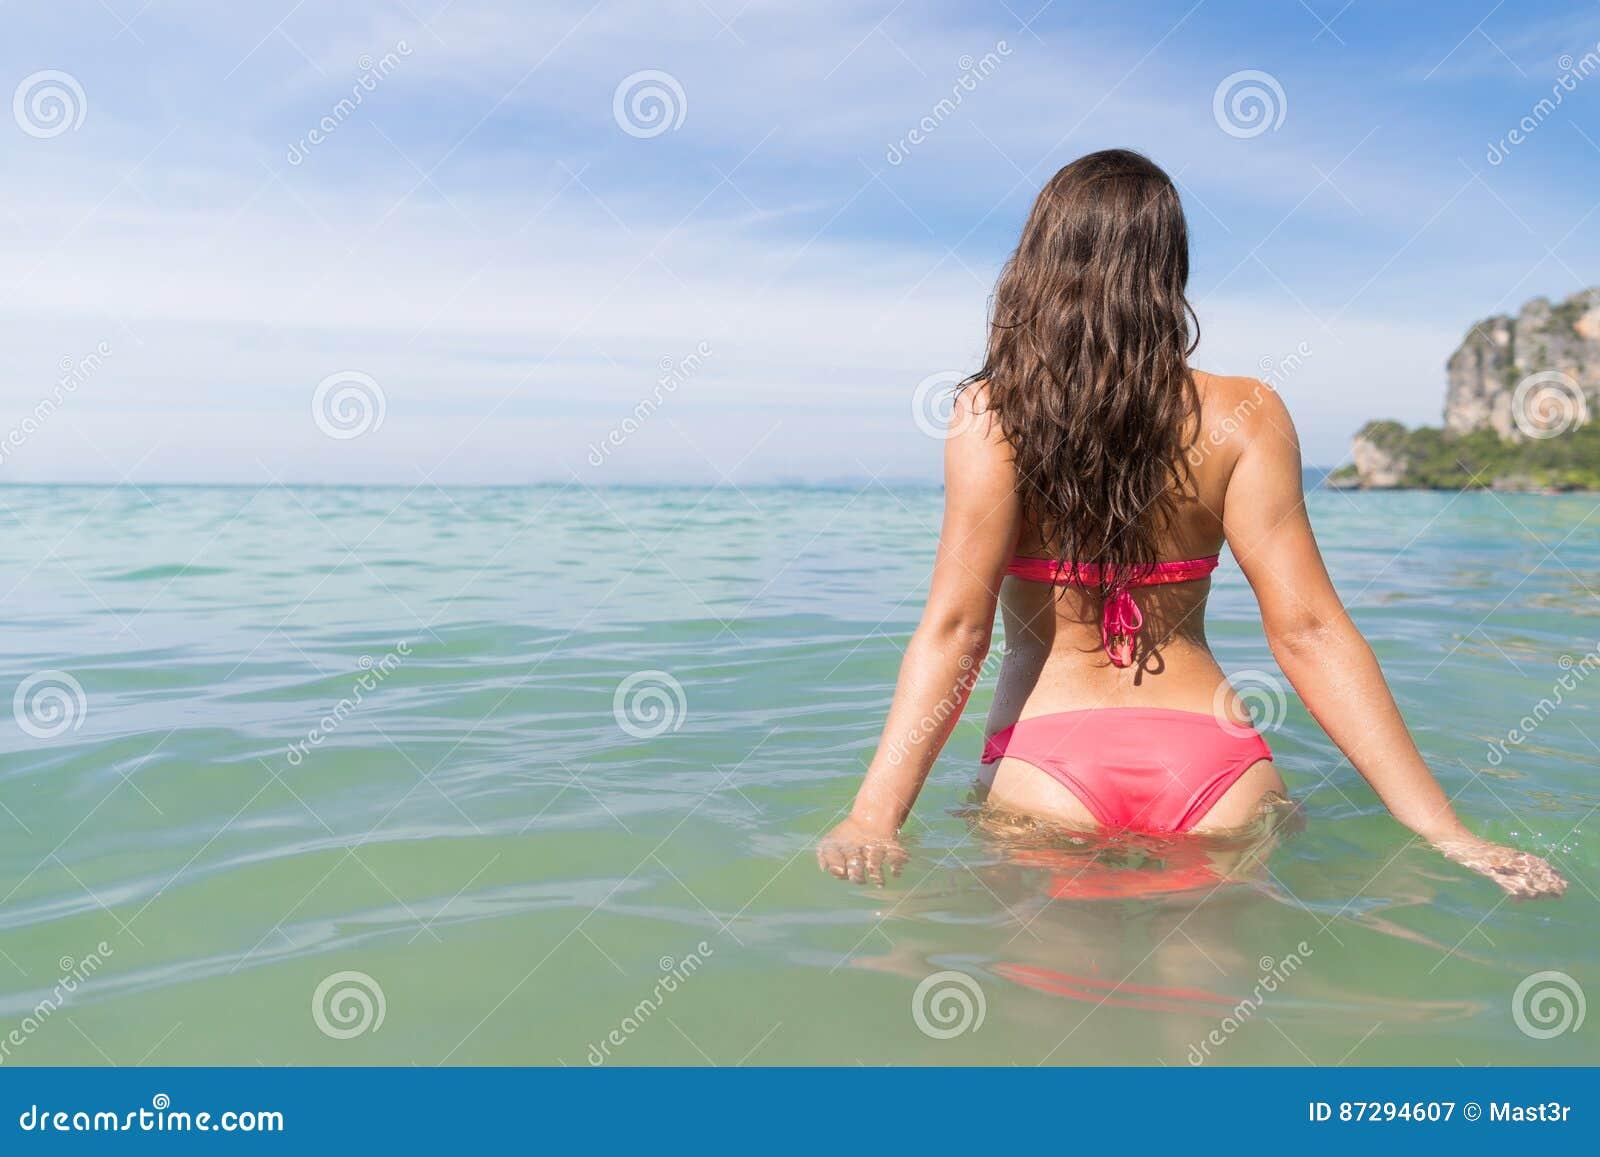 657e2c568fc Ελκυστική νέα καυκάσια γυναίκα στο μαγιό στην πλάτη παραλιών ...